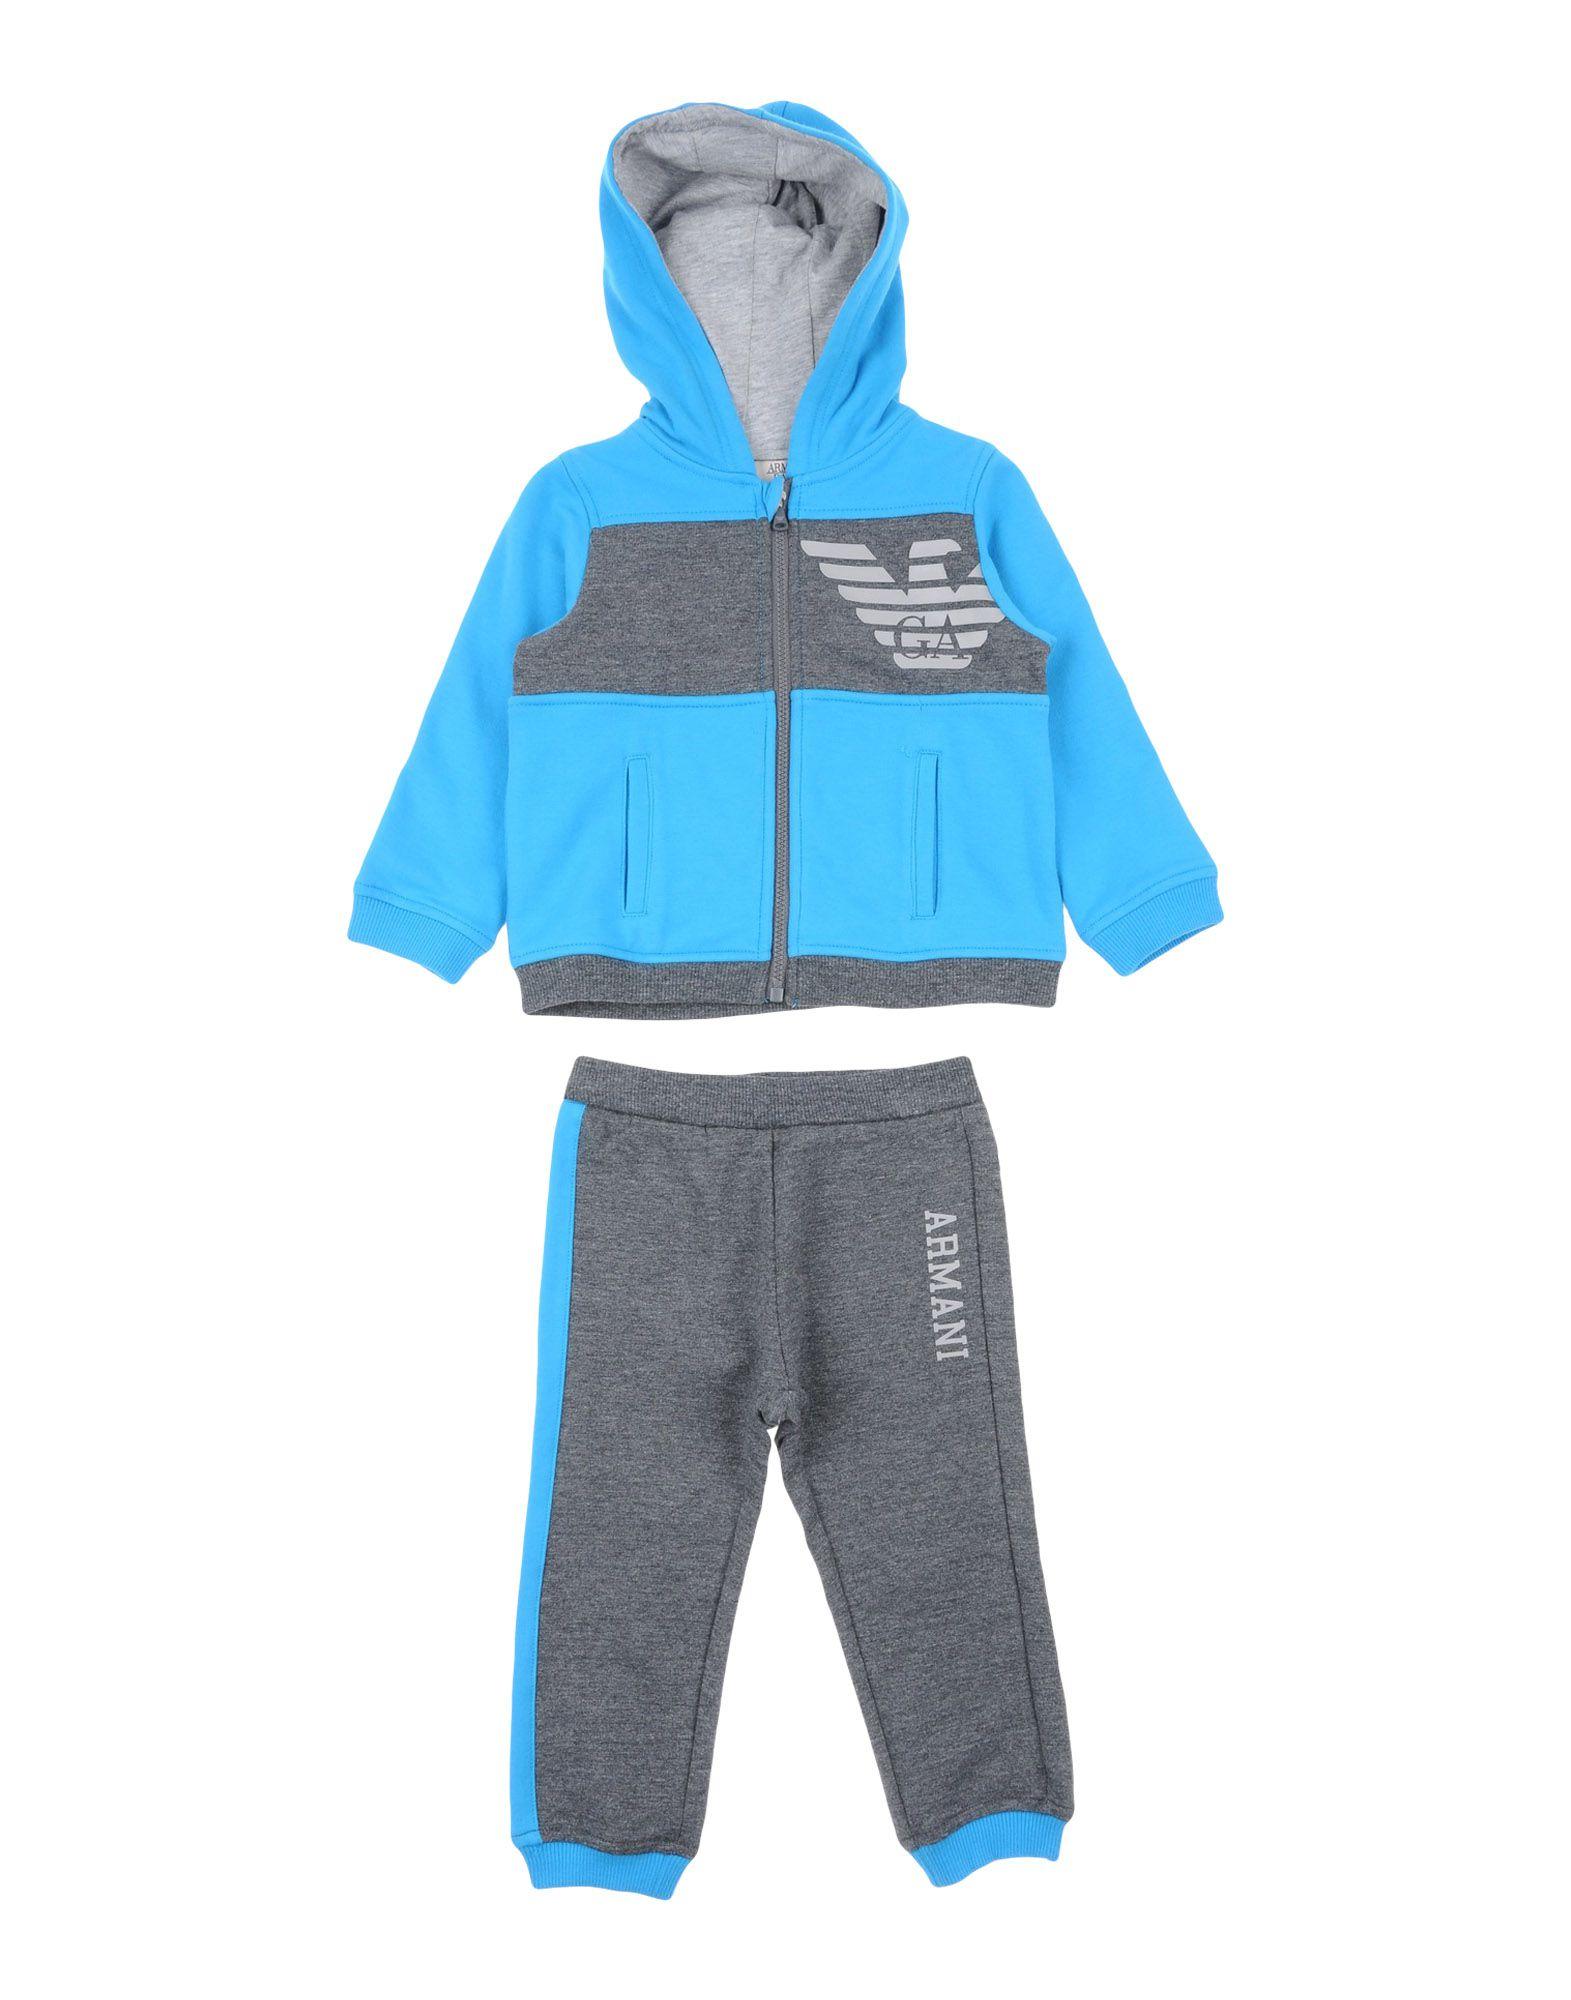 ff60823e9a6 Armani Junior Fleece Outfit Boy 0-24 months online on YOOX Finland